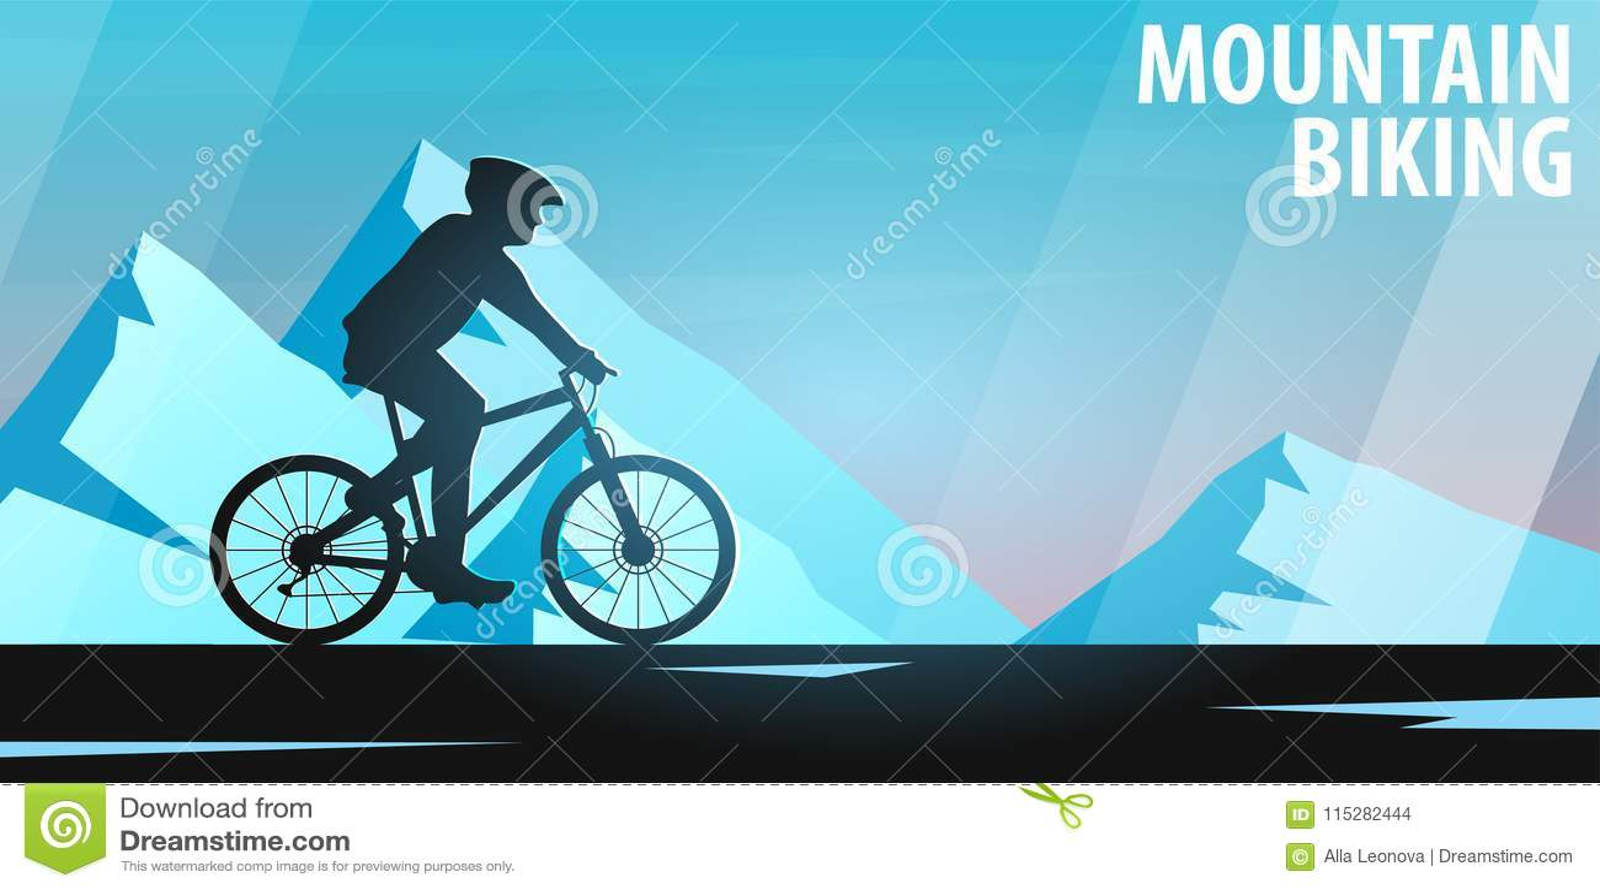 6a67d2ae231 Downhill Bike Stock Illustrations – 1,579 Downhill Bike Stock  Illustrations, Vectors & Clipart - Dreamstime